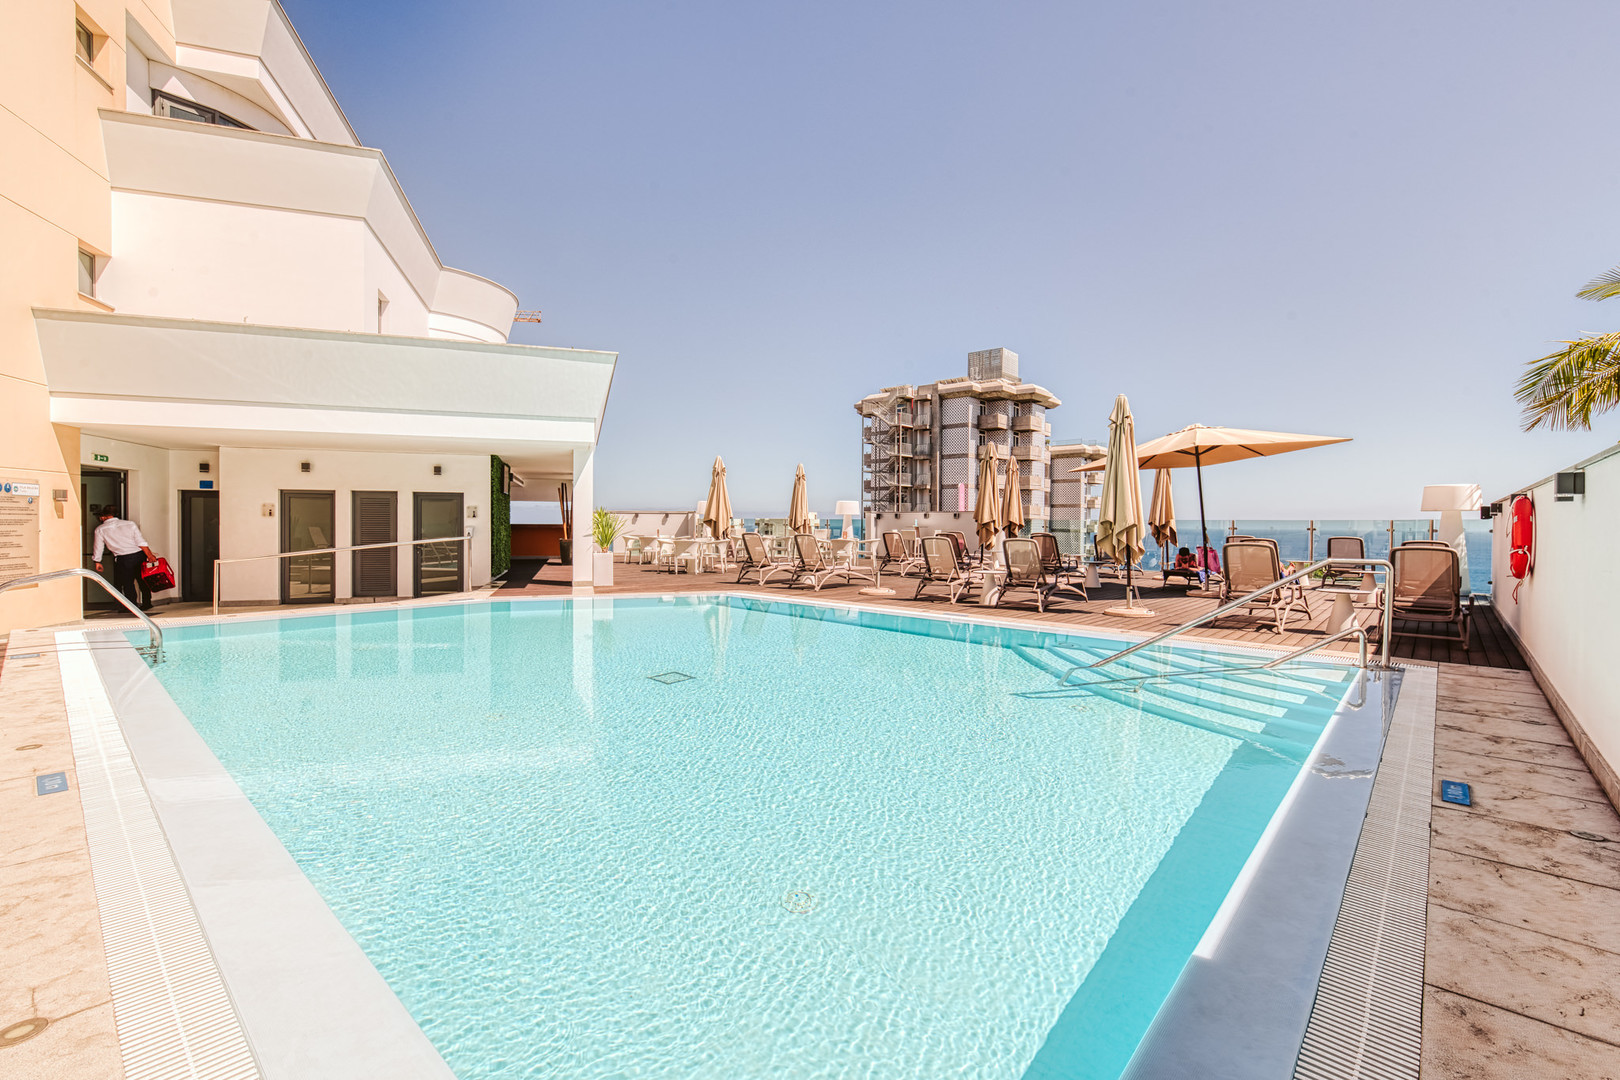 Hotel Vila Baleira Funchal #5